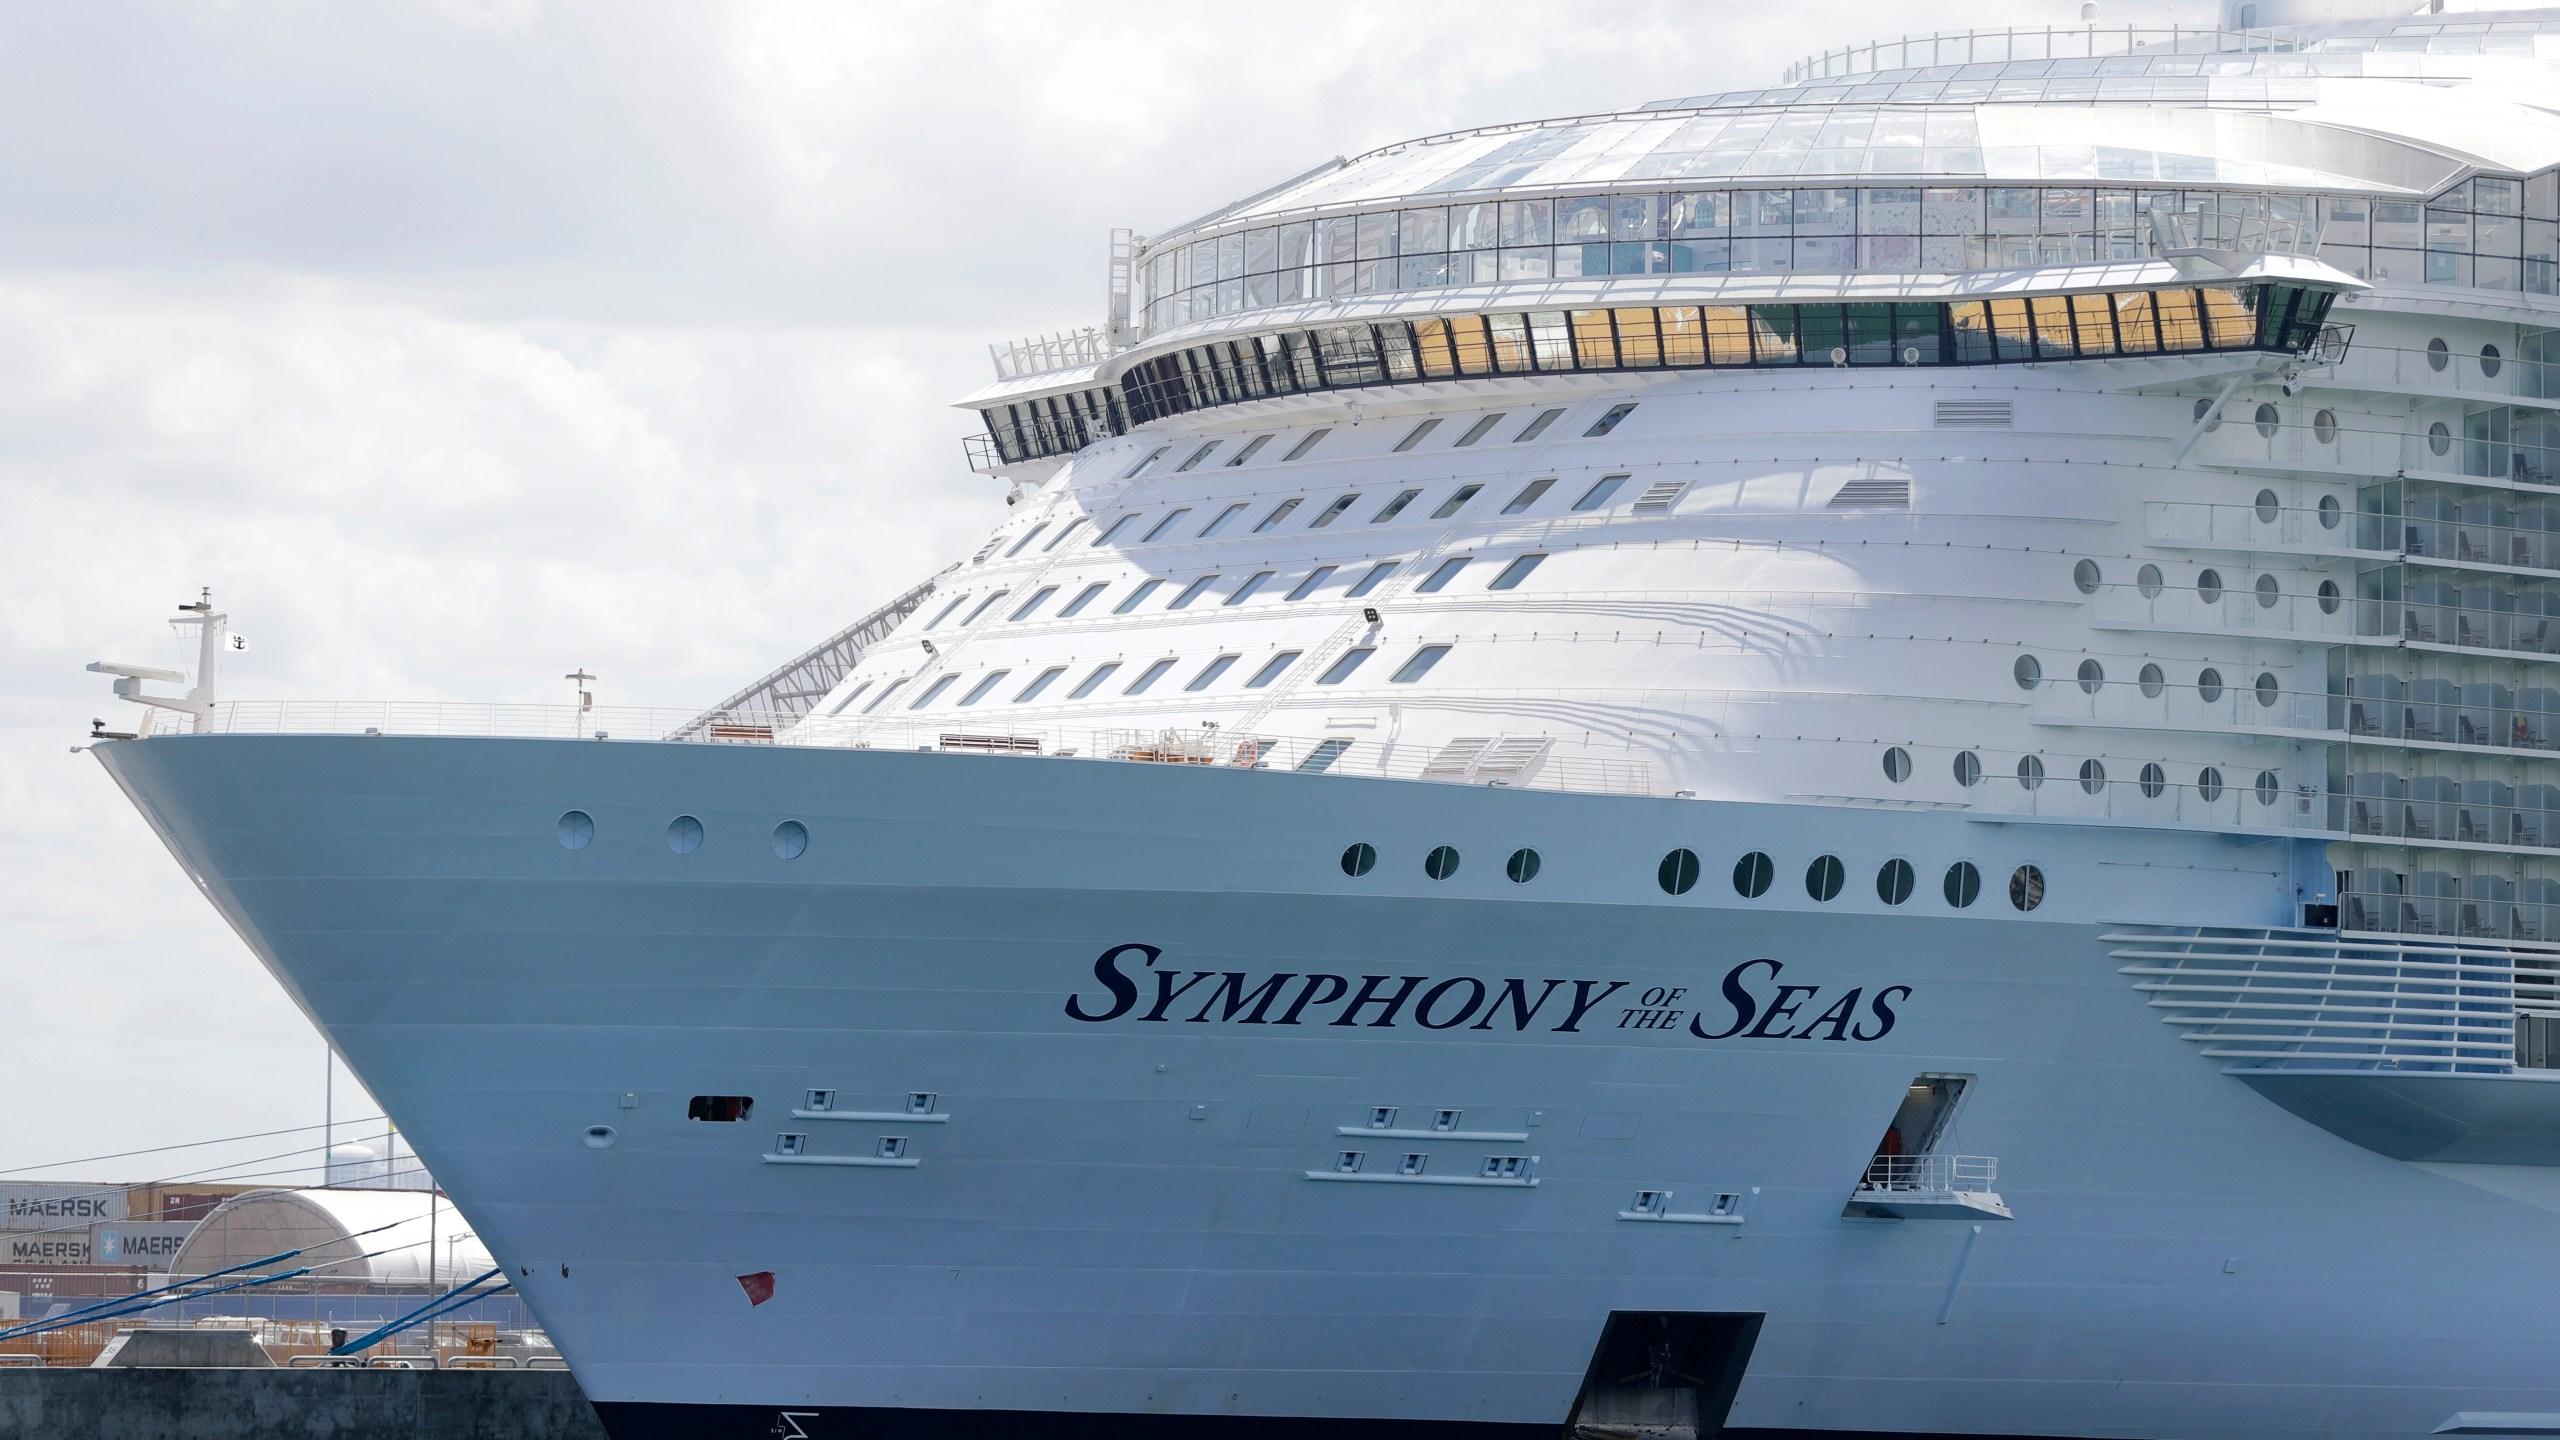 Symphony of the Seas